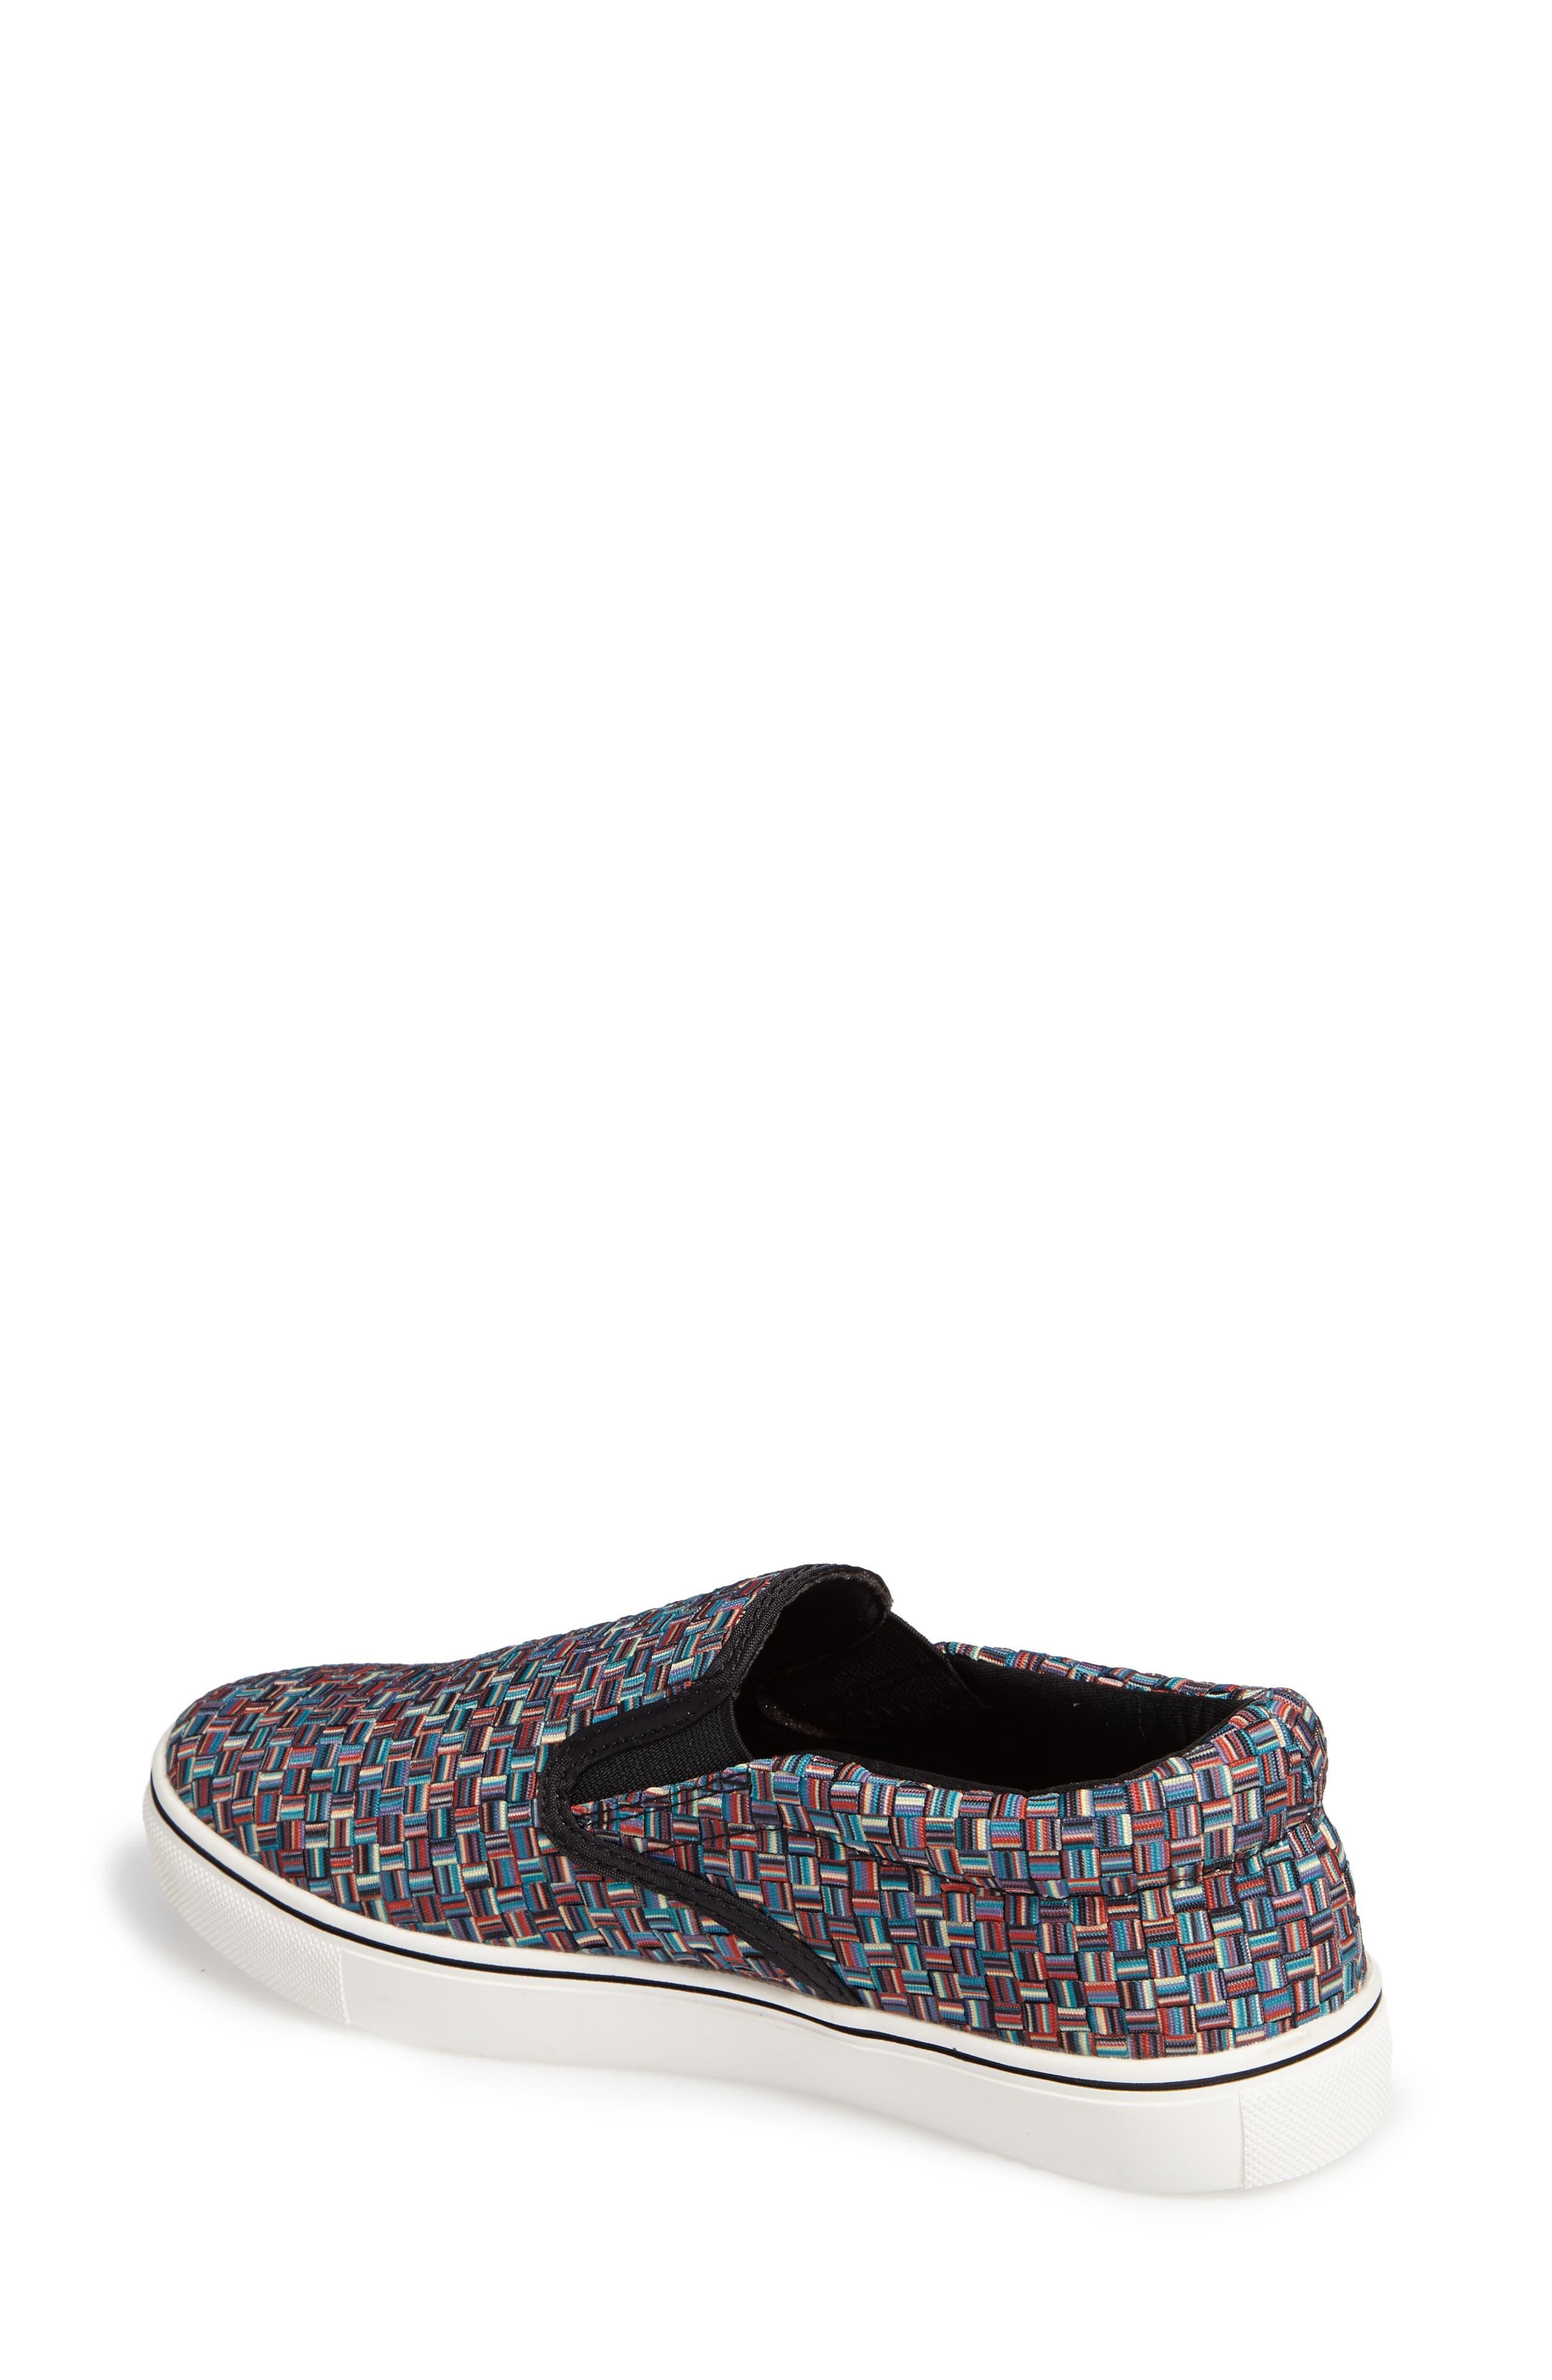 'Verona' Slip-On Sneaker,                             Alternate thumbnail 2, color,                             Lapis Multi Fabric